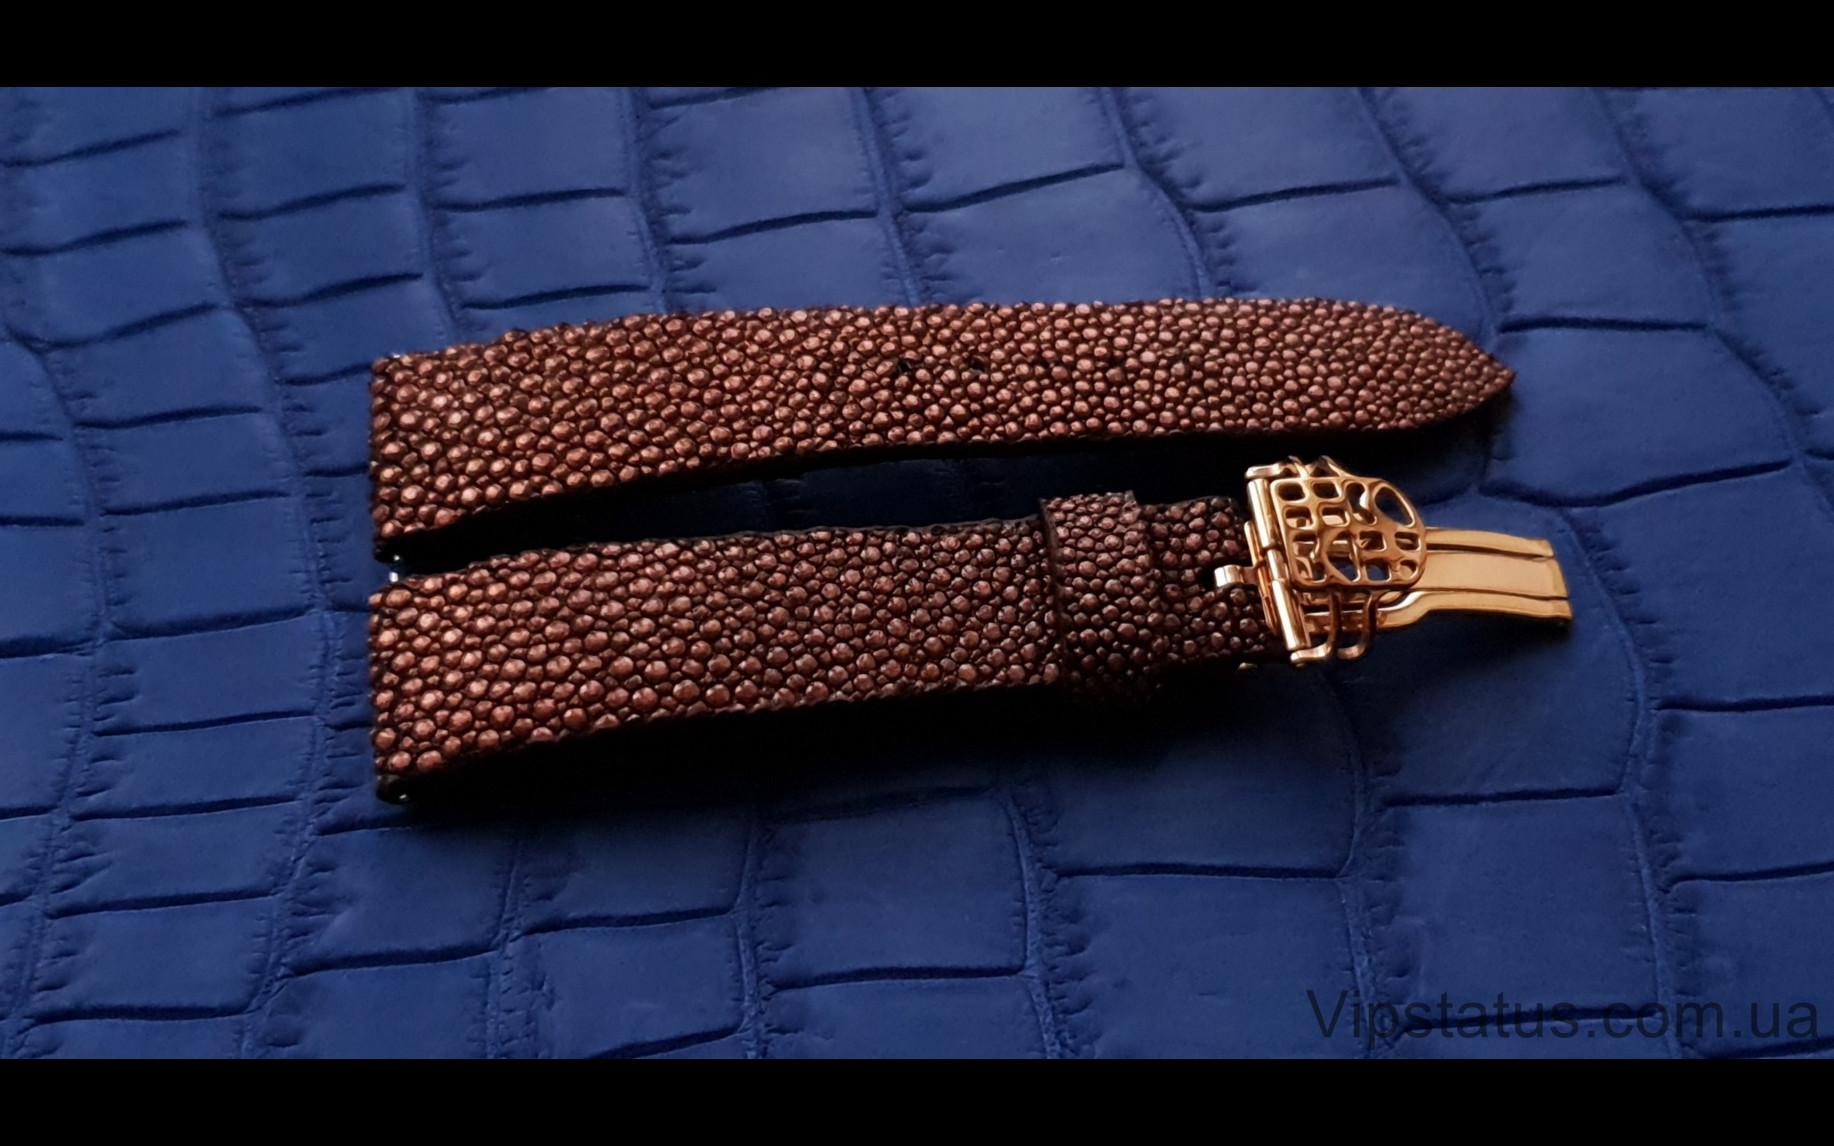 Elite Лакшери ремешок для часов Frederique Constant кожа ската Luxury Stingray Leather Strap for Frederique Constant watches image 2